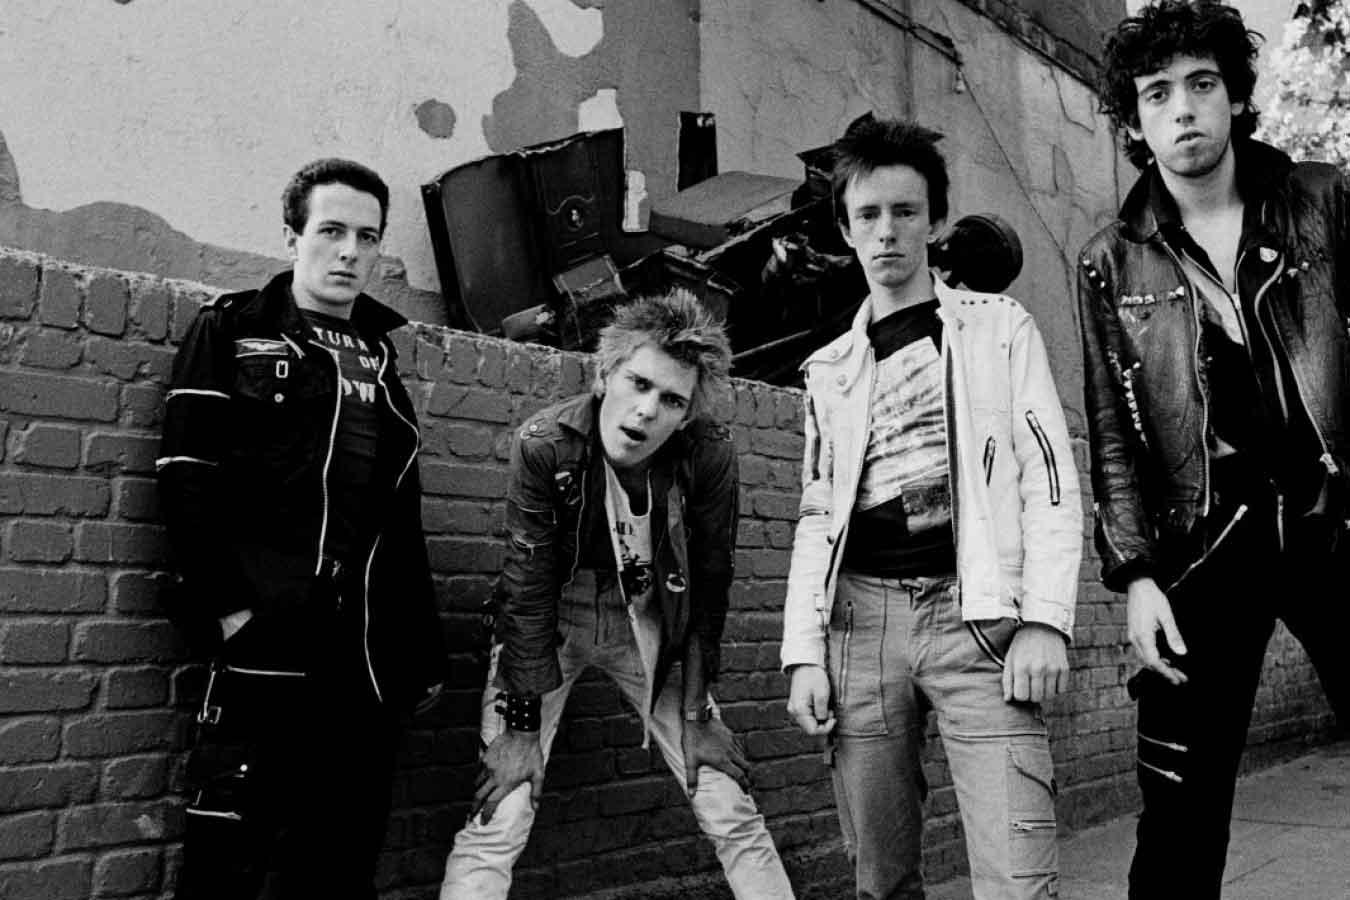 8 aprile nel rock: The Clash, Steve Howe, Izzy Stradlin, Ezra Koenig, Guns N' Roses, The Rolling Stones